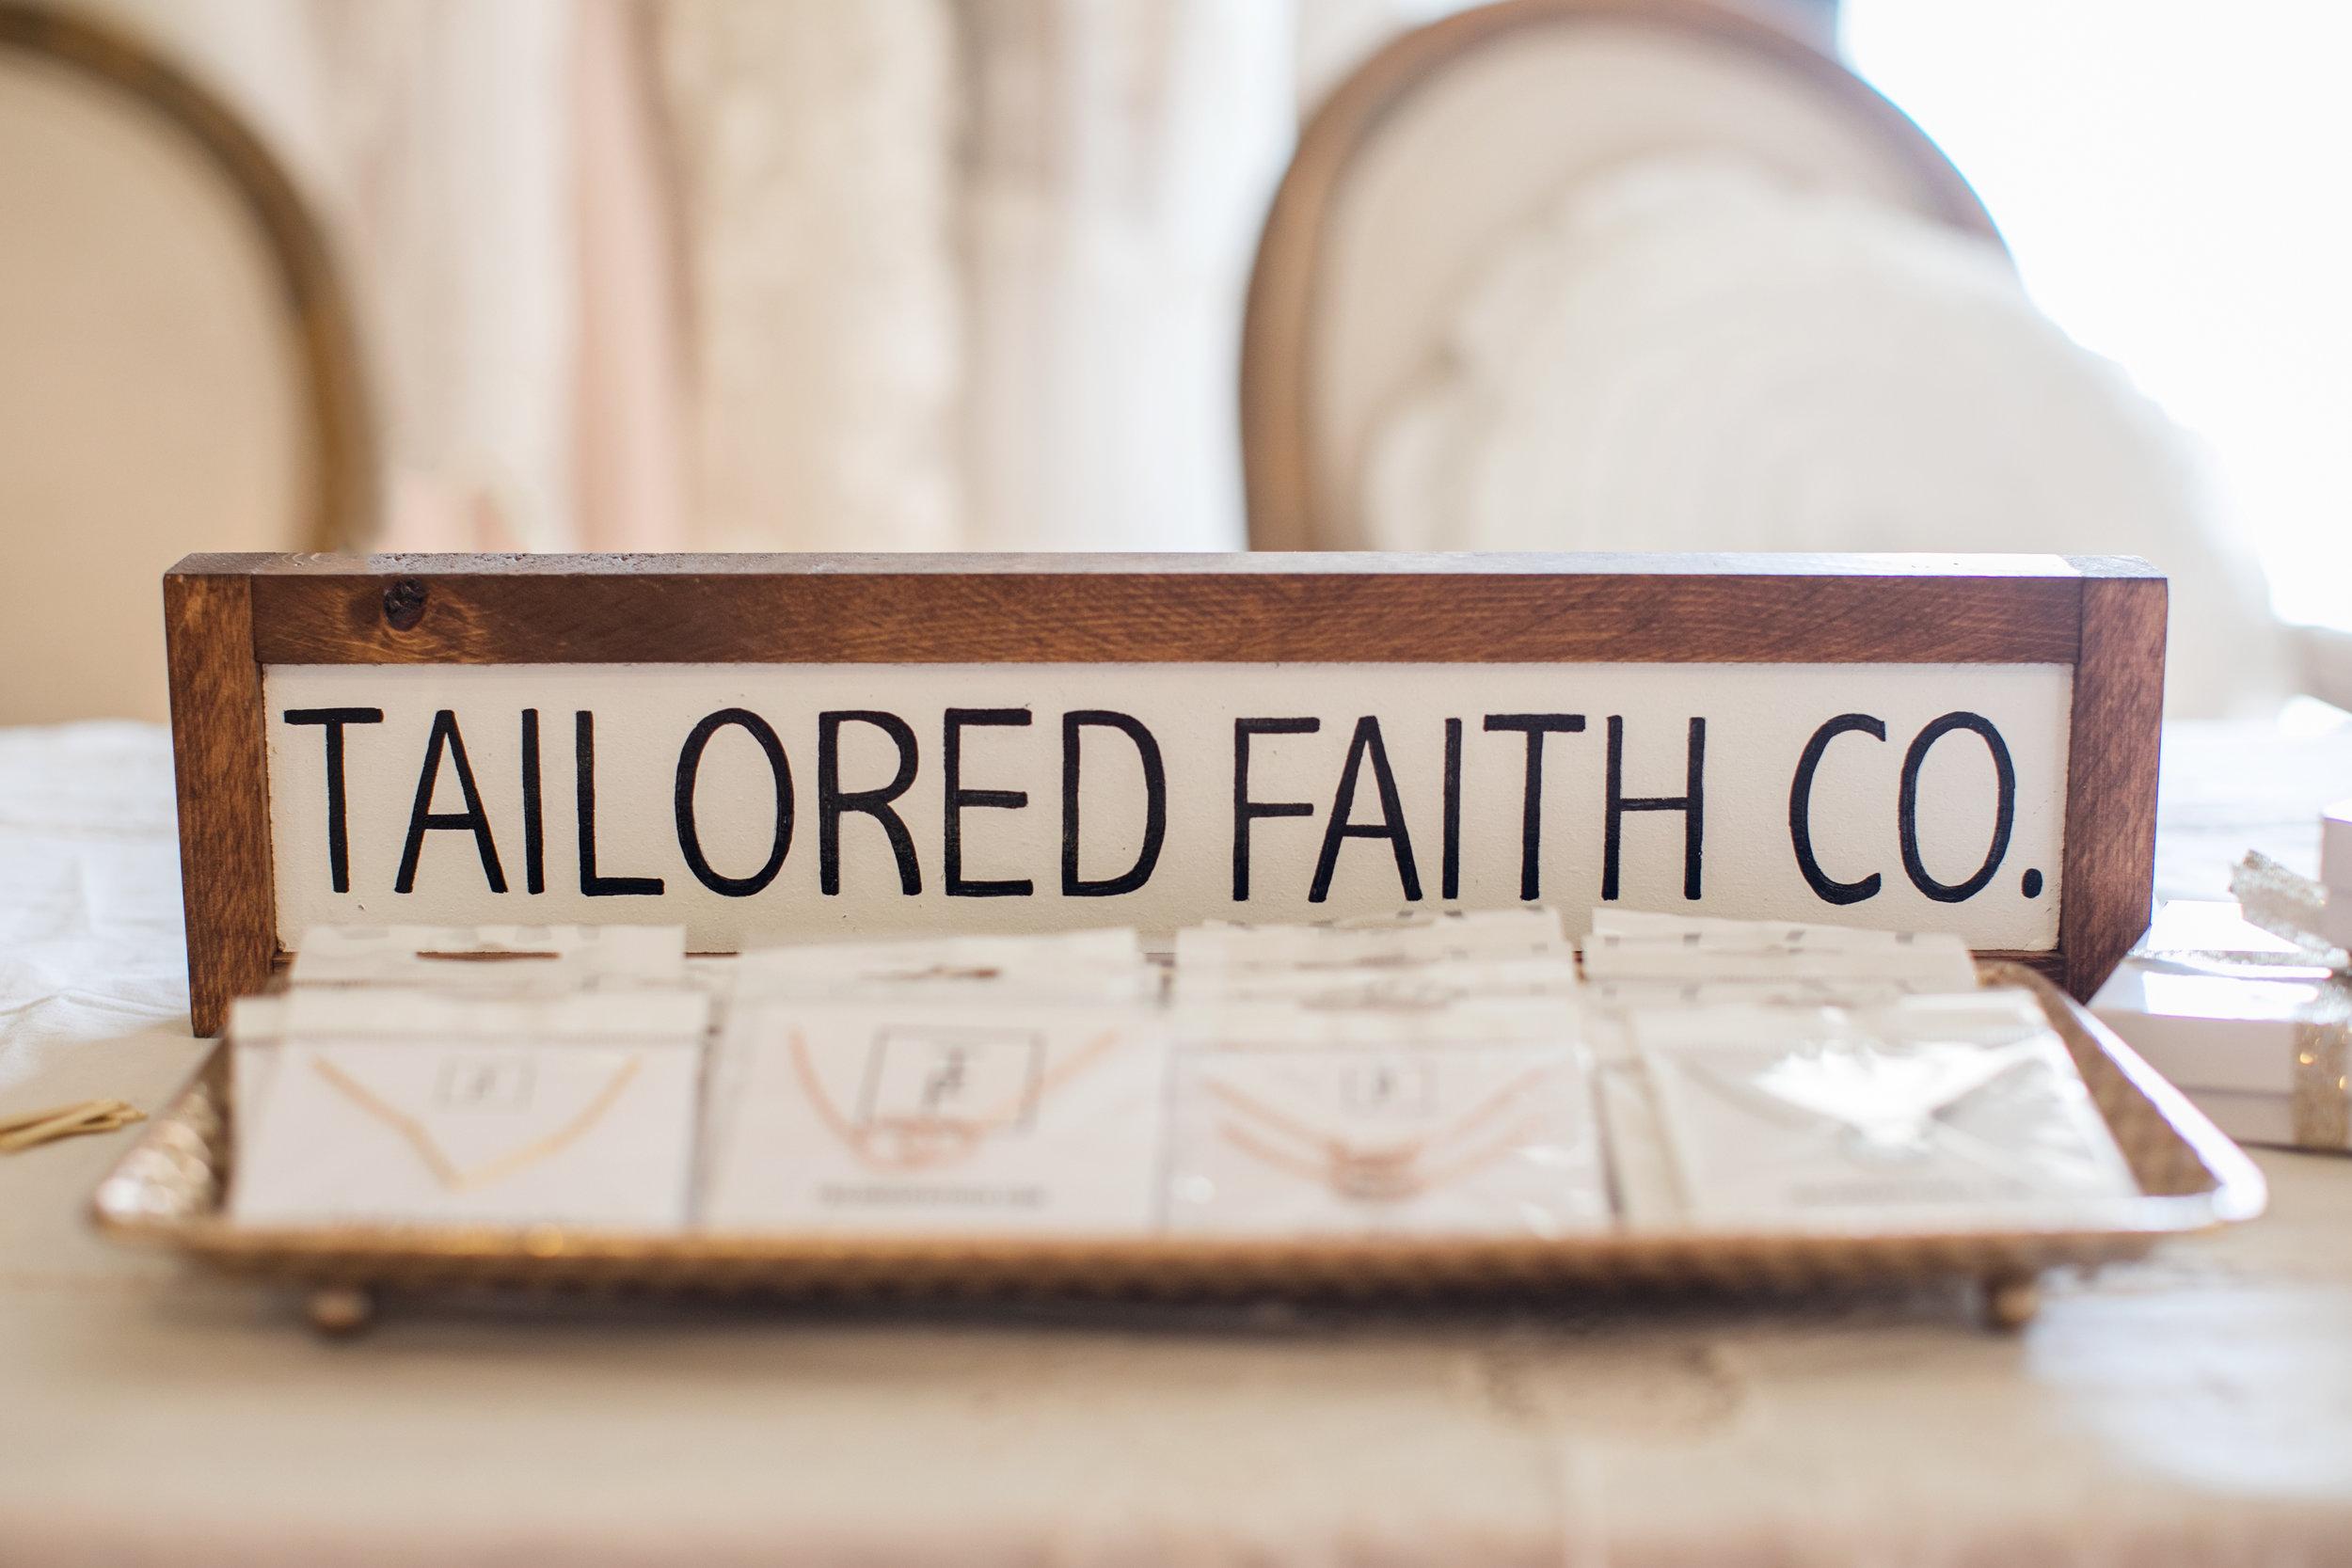 tailored faith co. jewelry